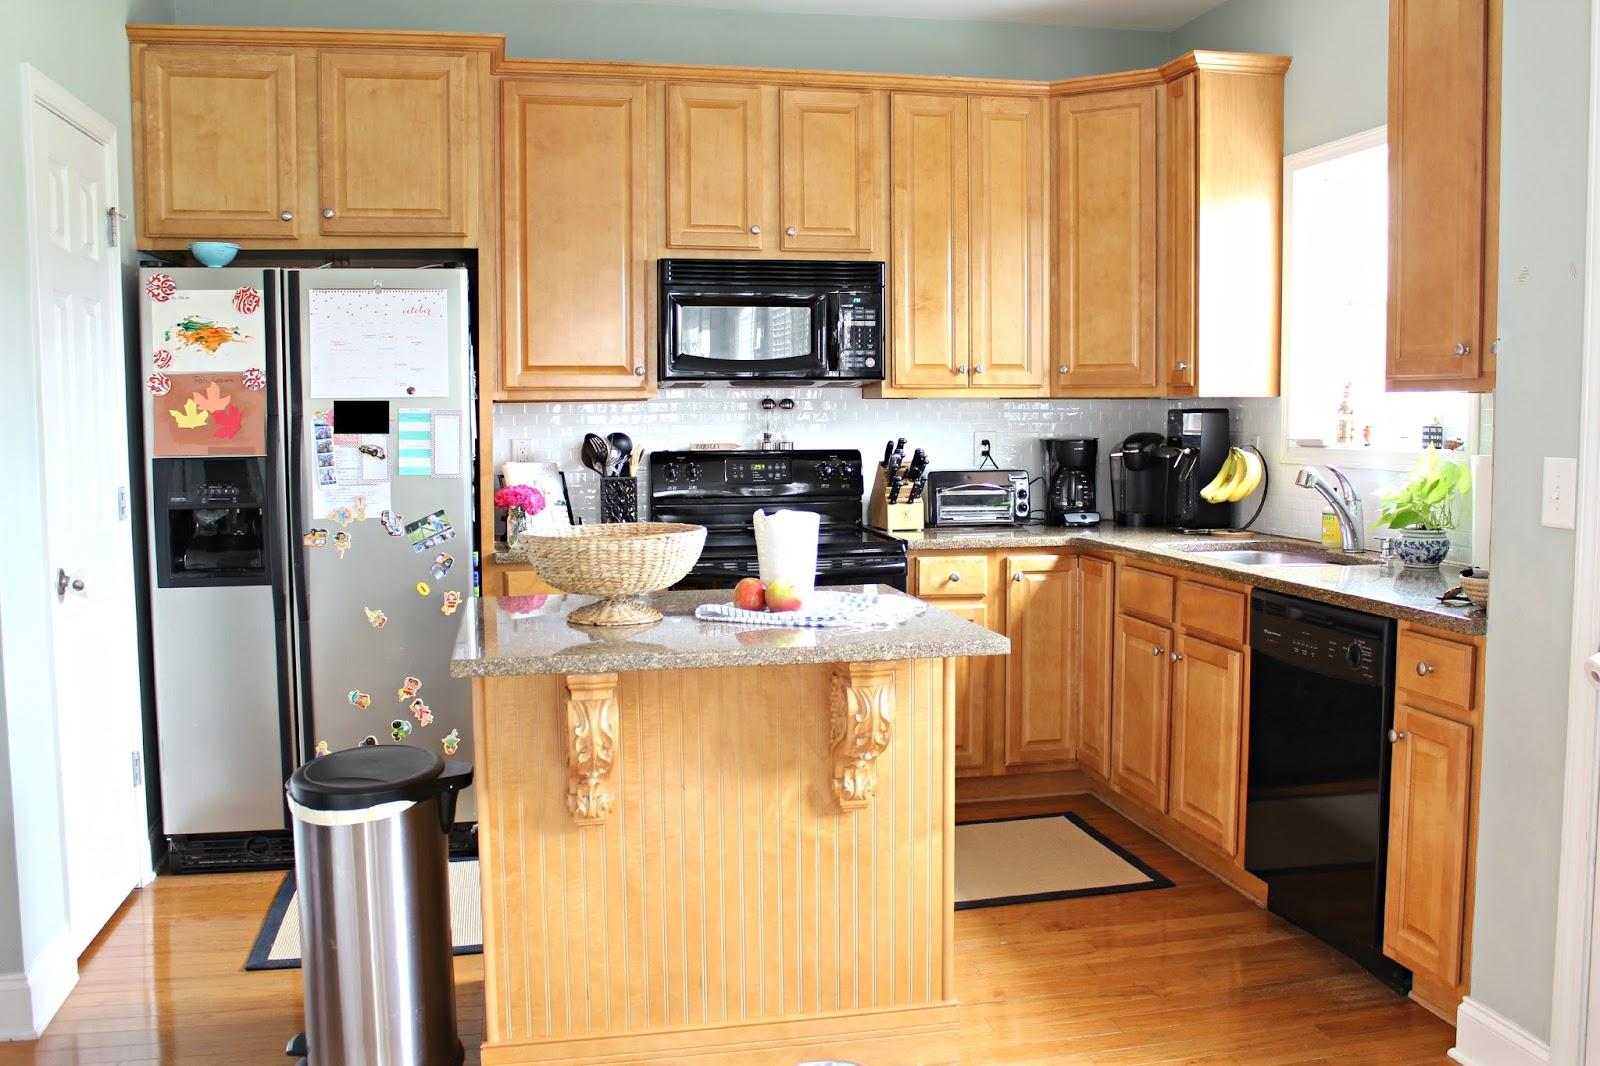 kitchen rental metal shelf ten june how to update a with peel stick tile